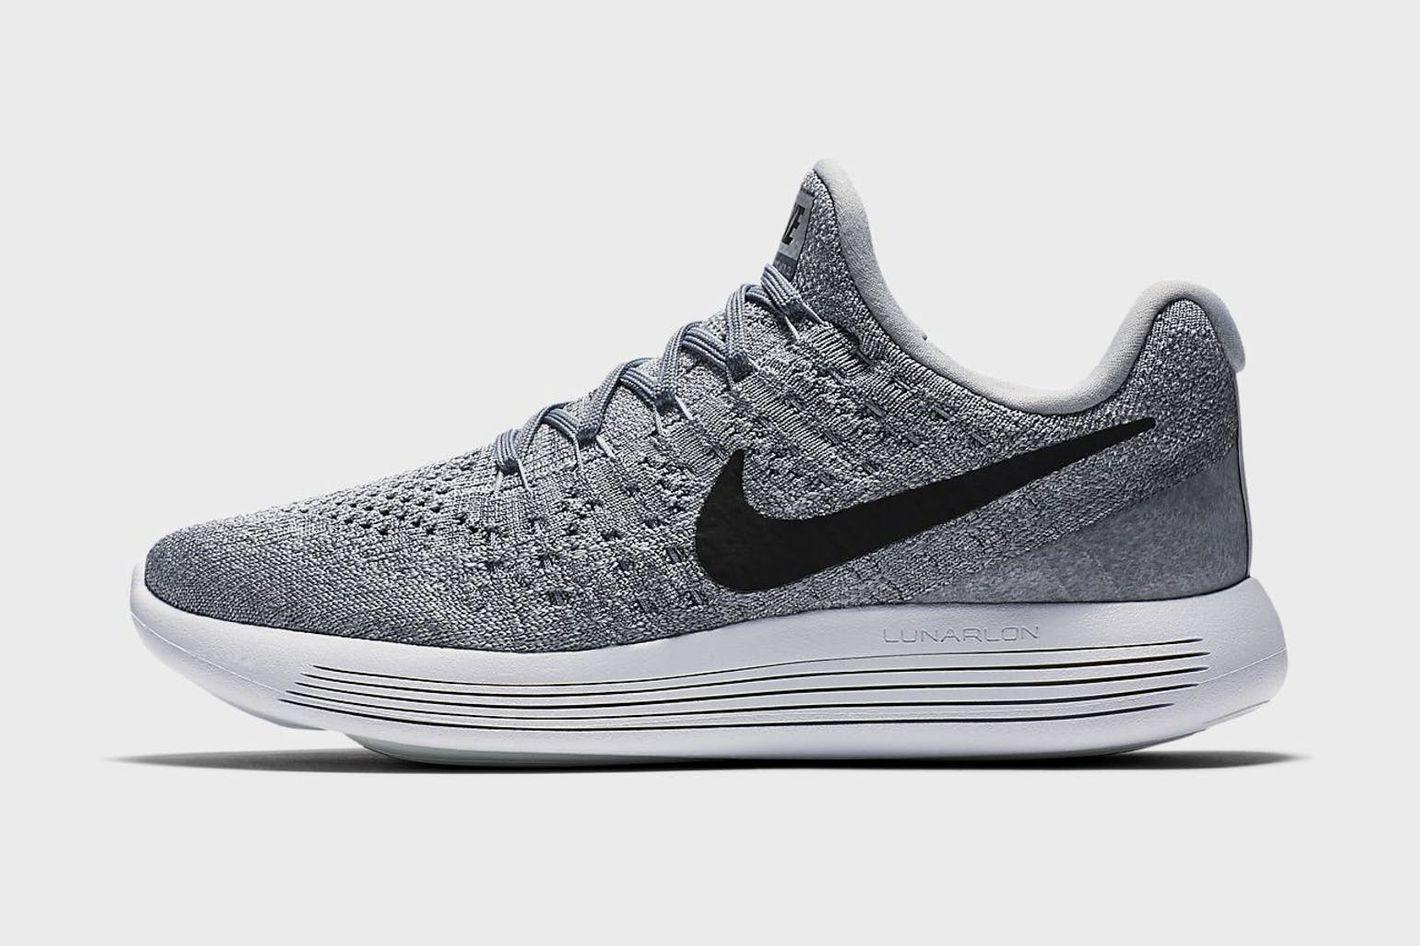 cf3d374f07ff0 Nike LunarEpic Low Flyknit 2 Women s Running Shoe